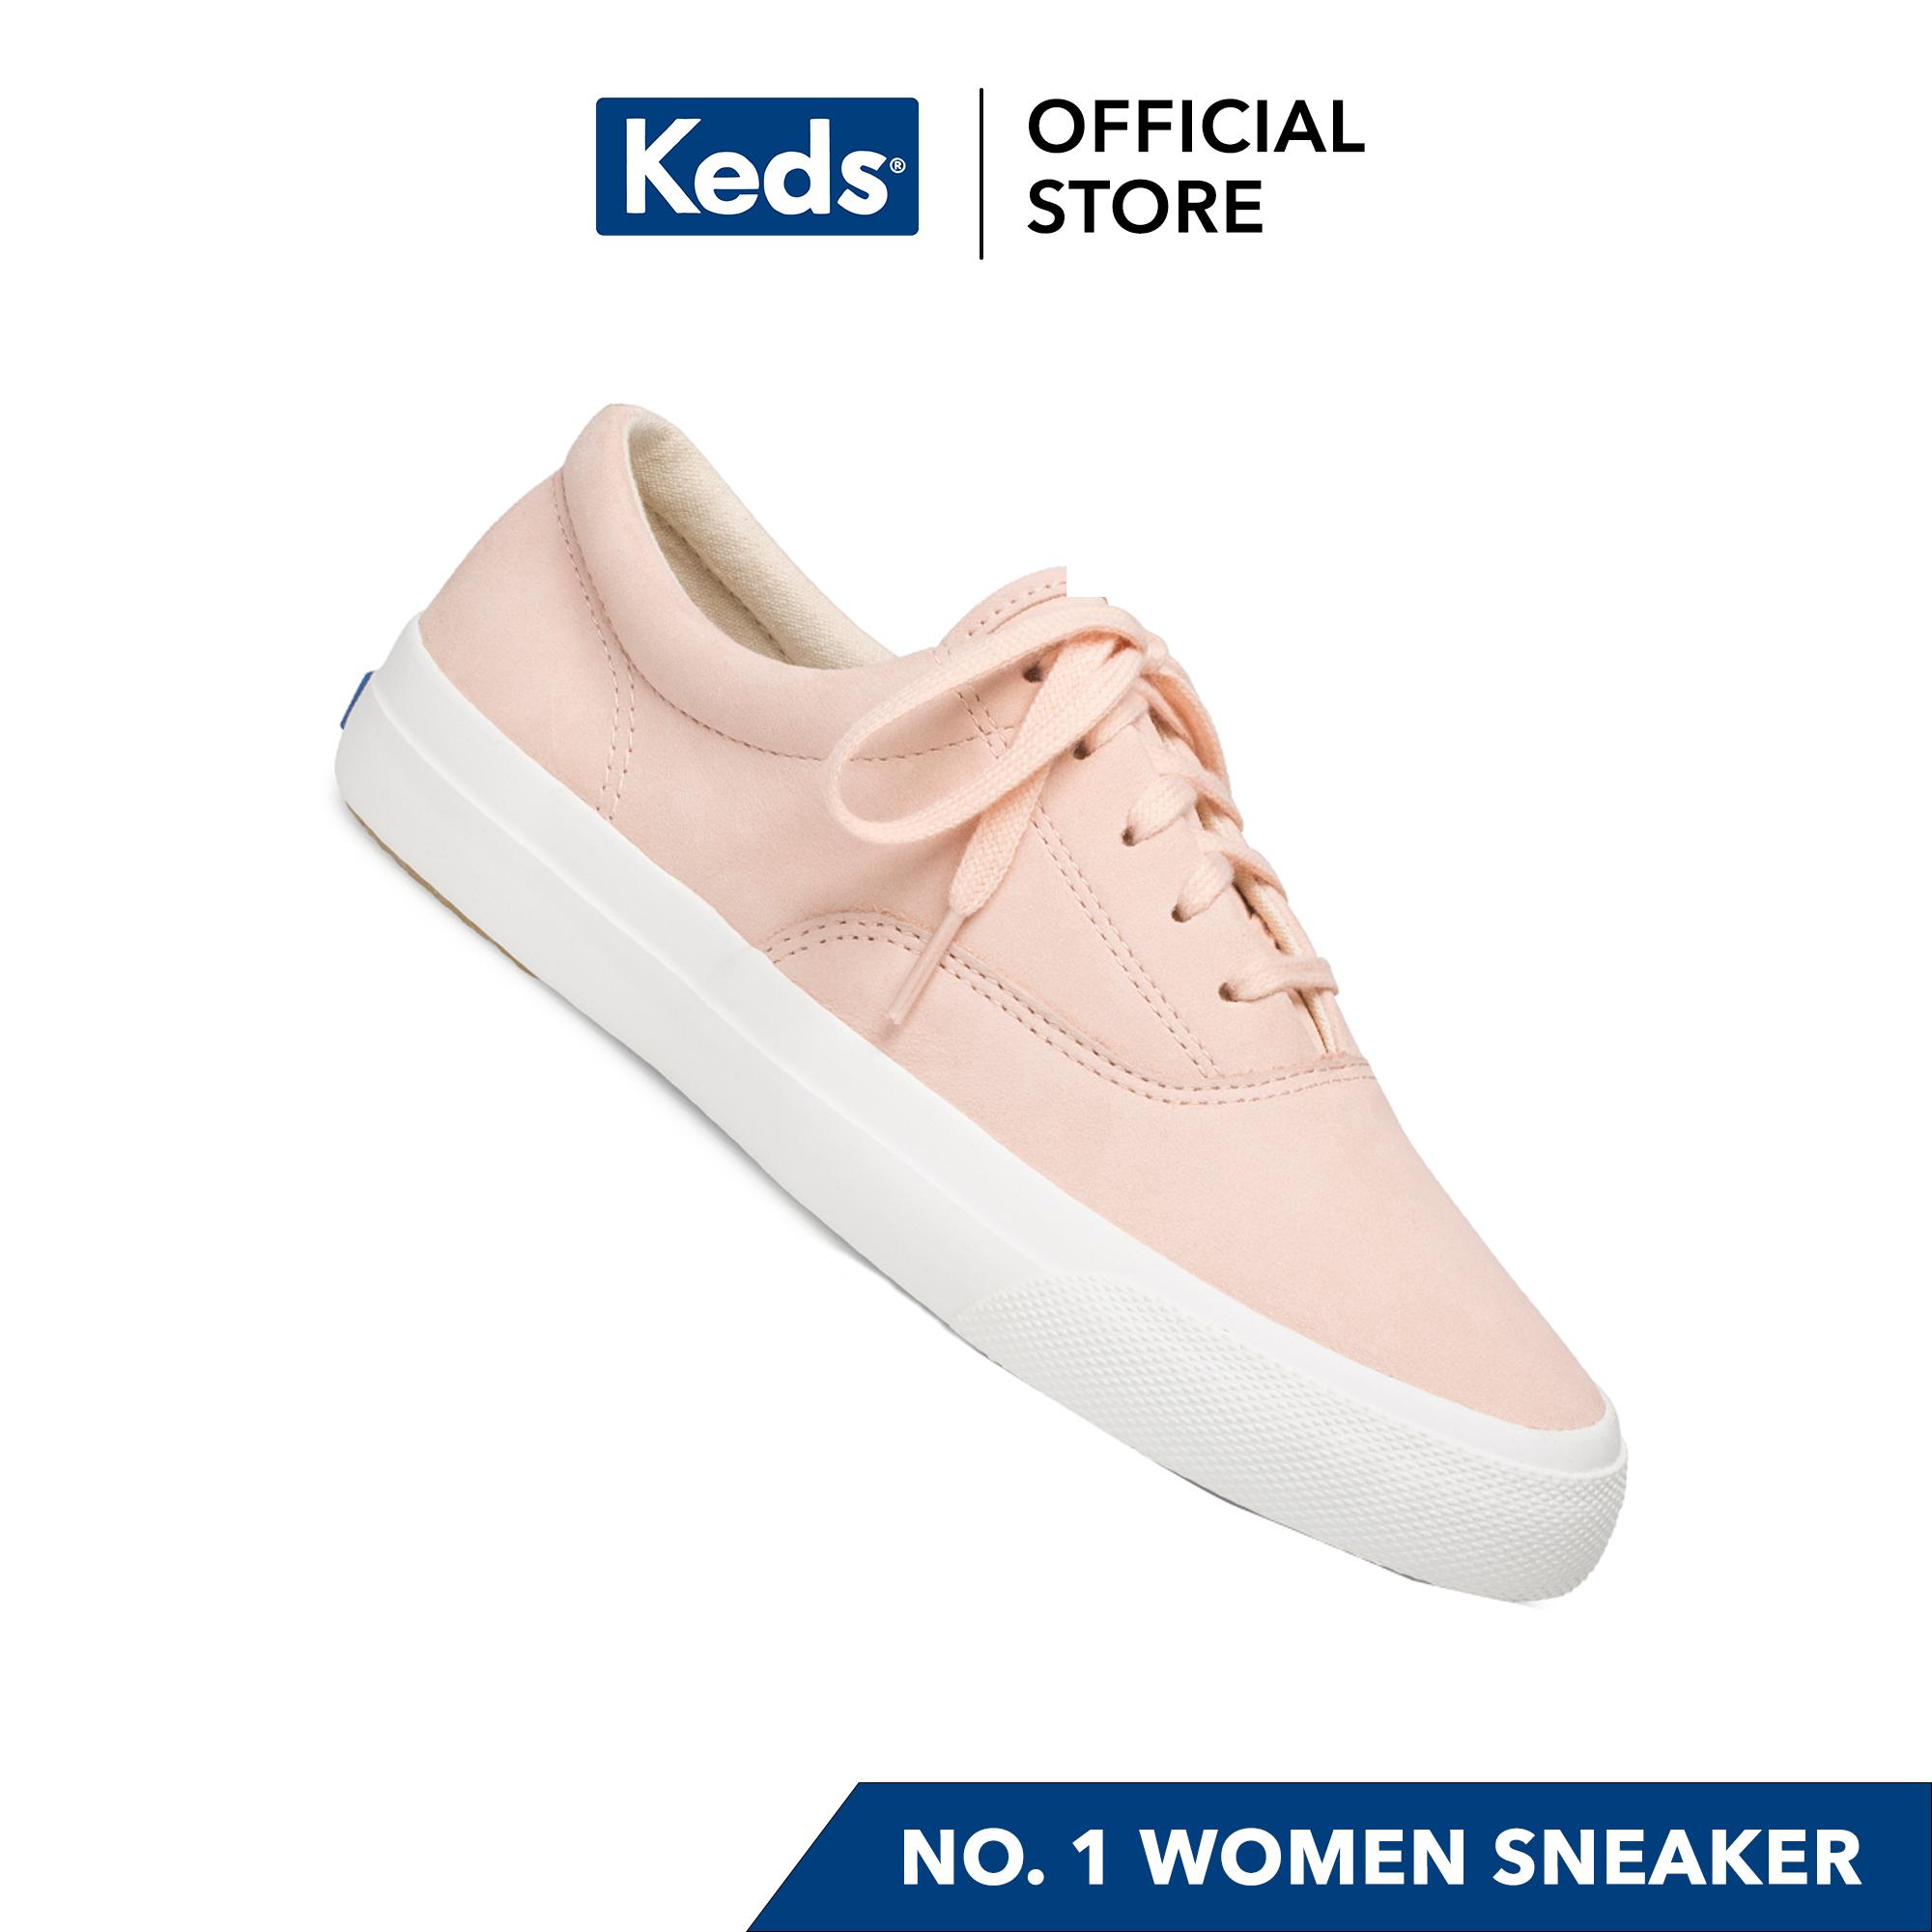 Keds Anchor Nubuck Sneakers (Light